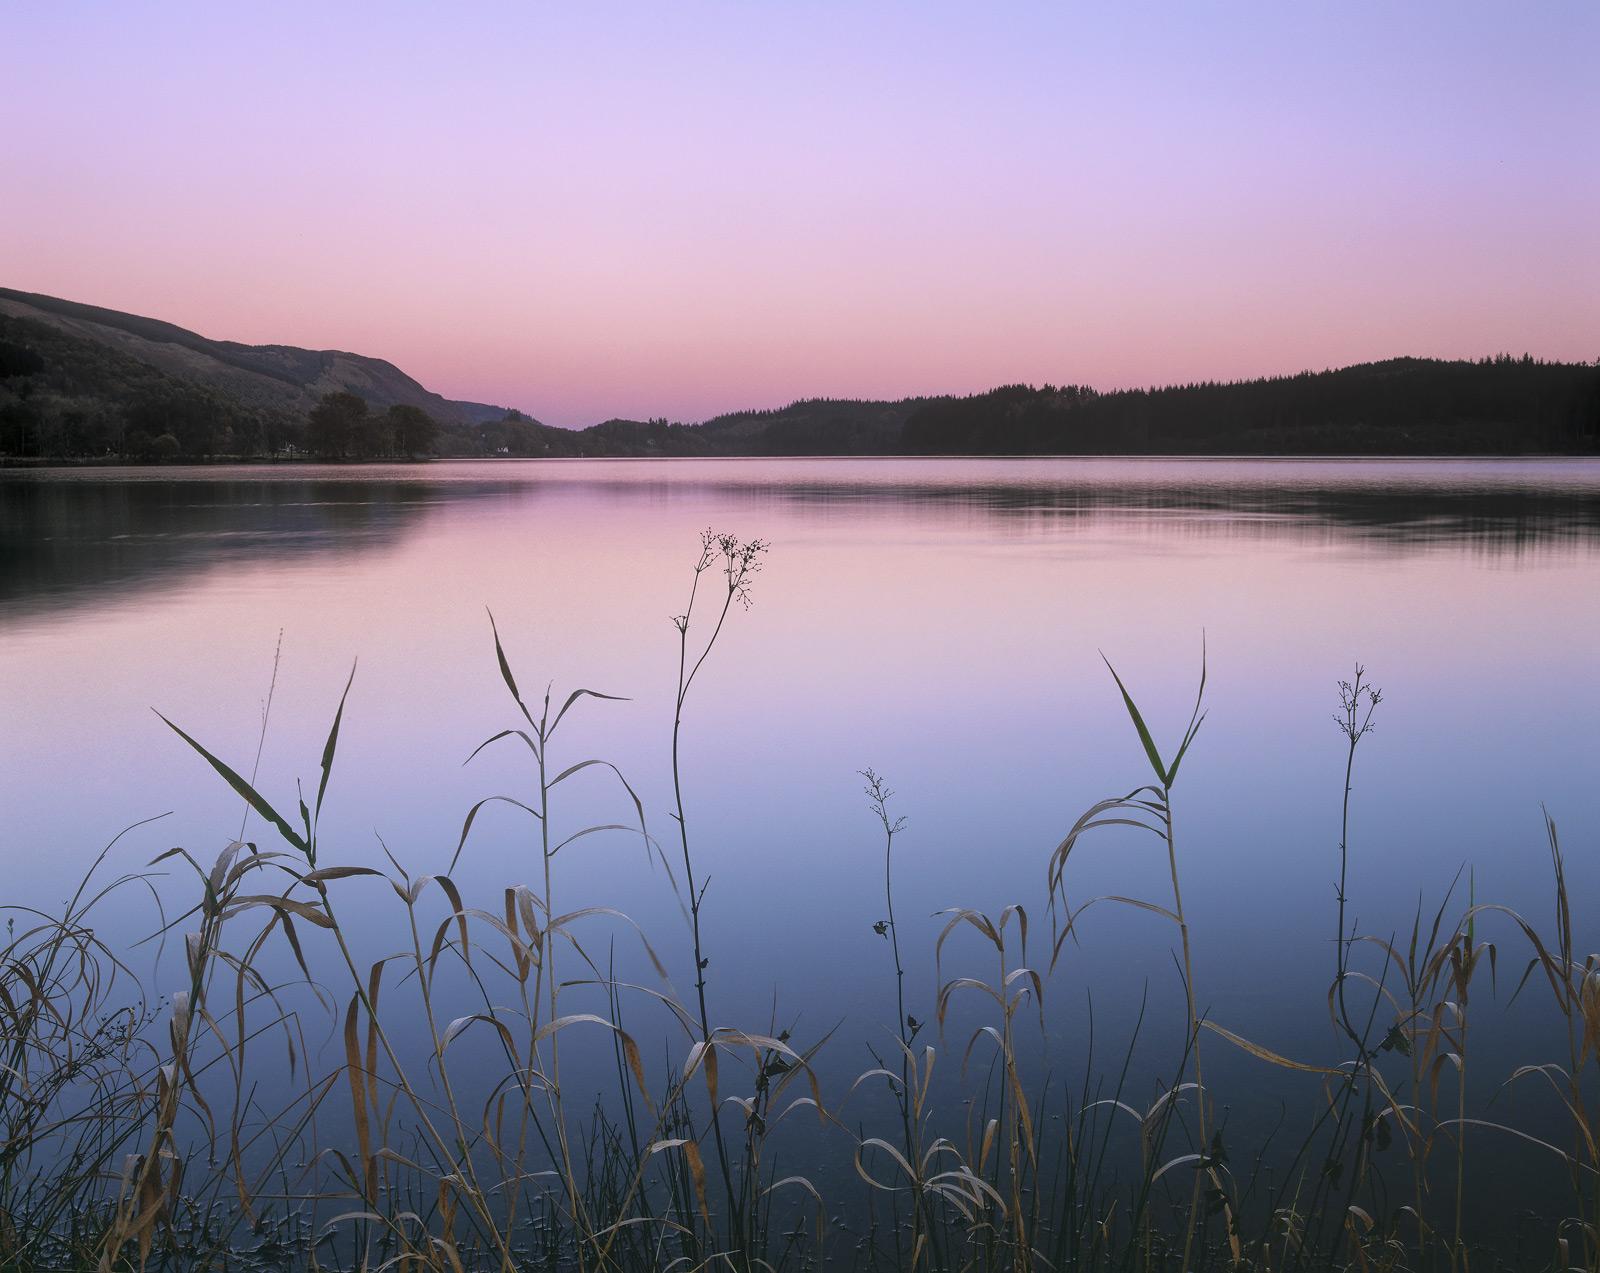 Gentle Twilight, Kinlochard, Trossachs, Scotland, sultry, still, evening, Earths shadow, plum, twilight, blue, reeds, wi, photo